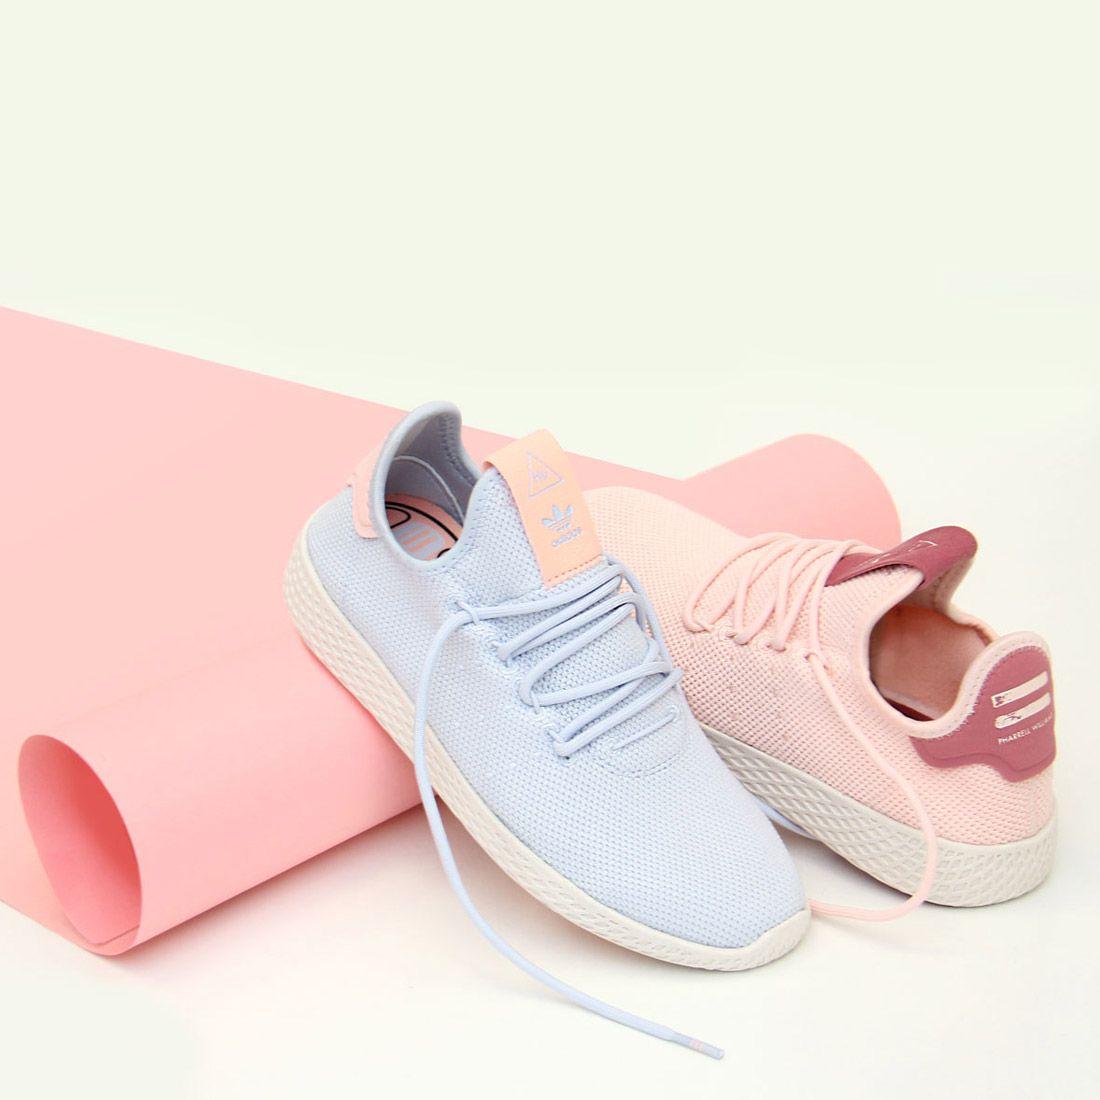 super popular 328c8 30de7 Un toque de color pastel ¿azul o rosa  Zapatillas Pharrell Williams Tennis  Hu de Adidas Originals  zacaris  newcollection  aw18  shoponline